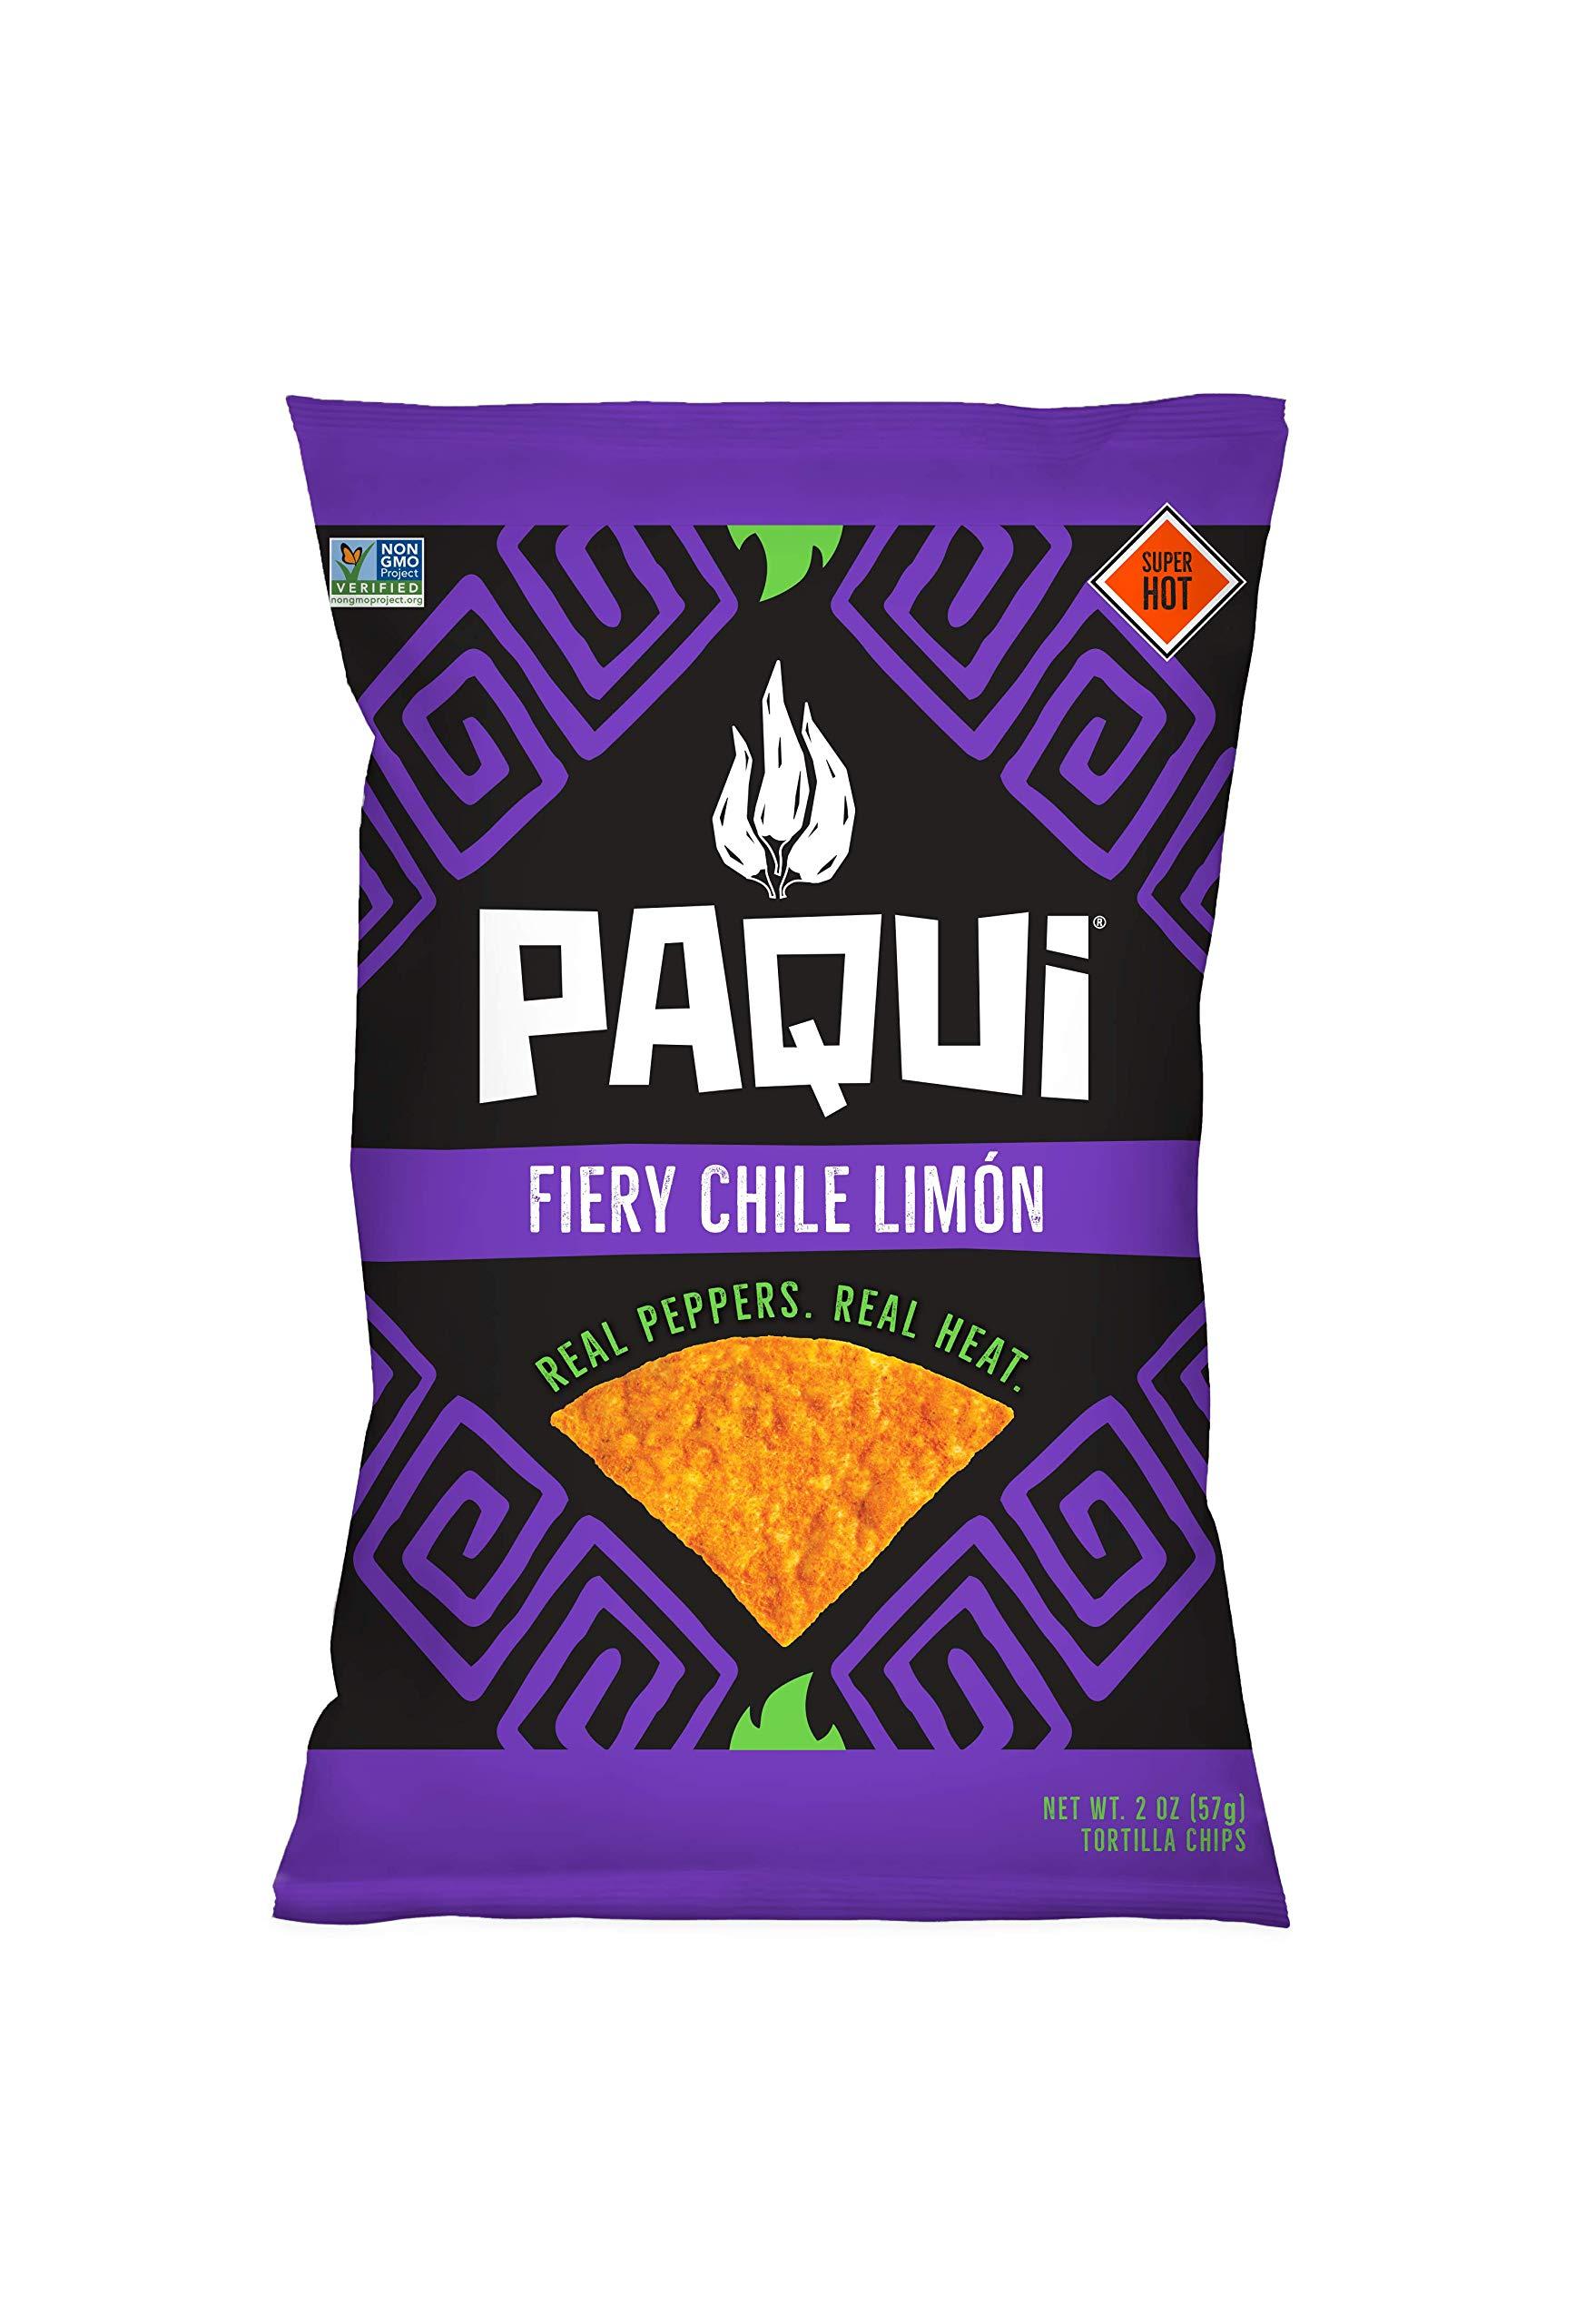 Paqui Paqui Chile Limon, 6Count by Paqui